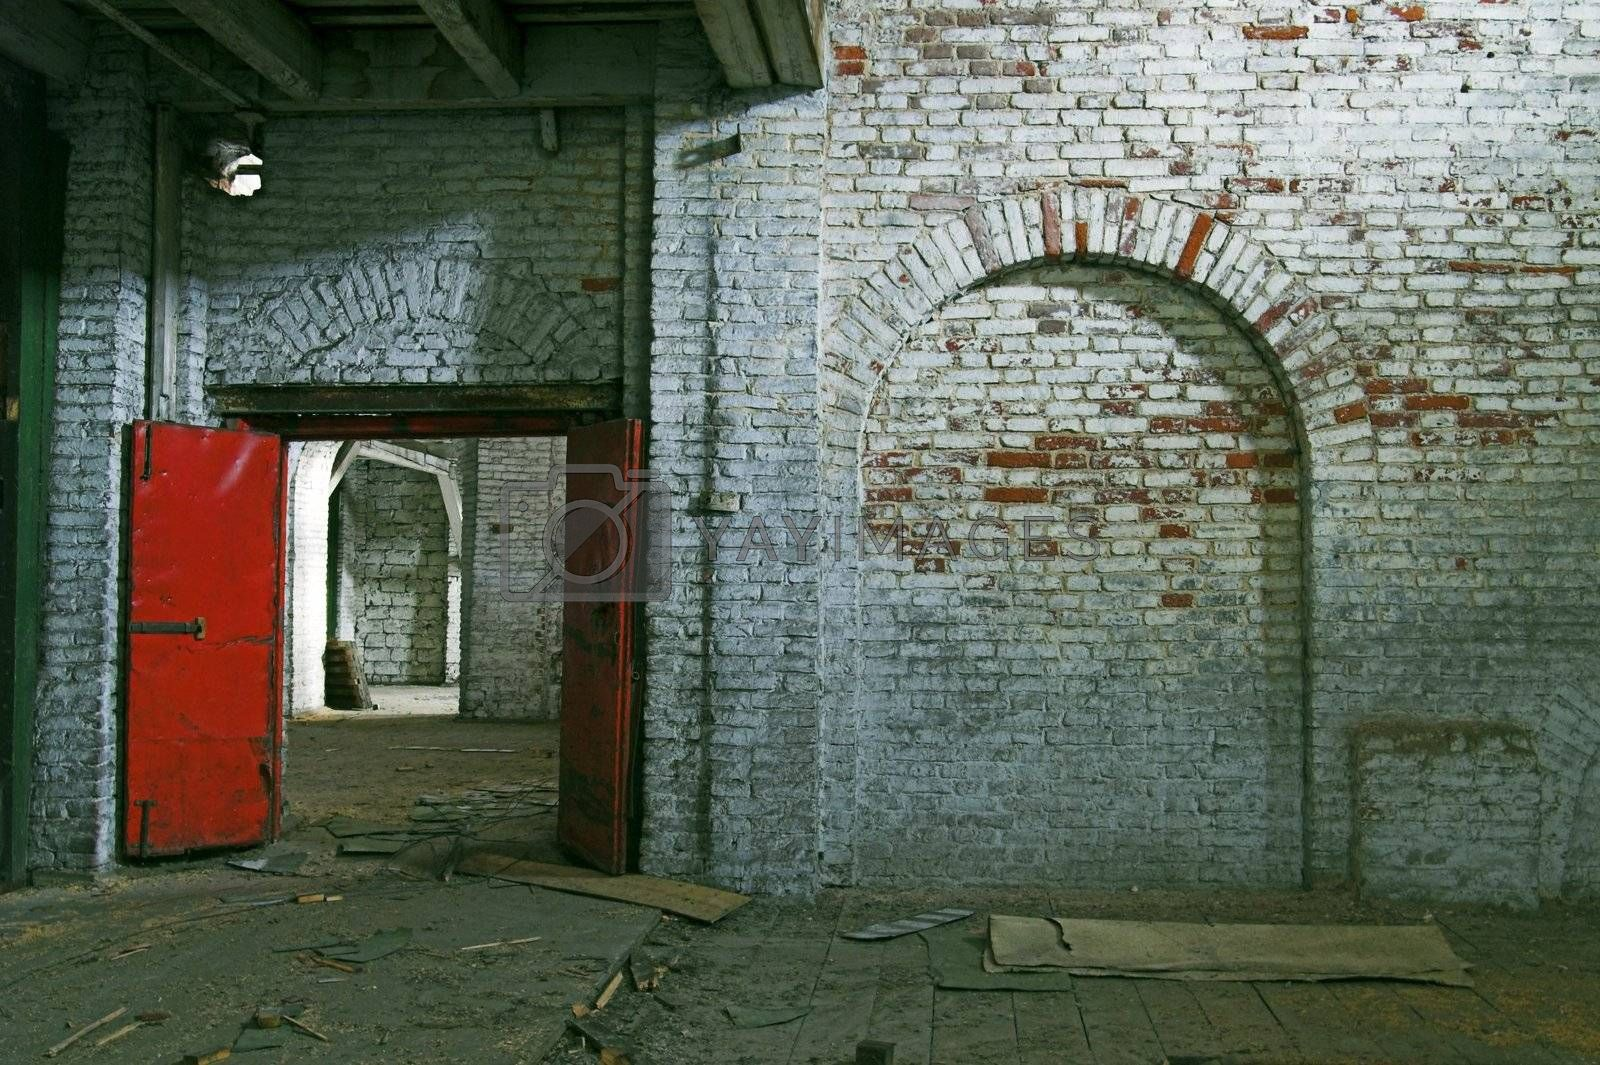 Abandoned Storehouse Building